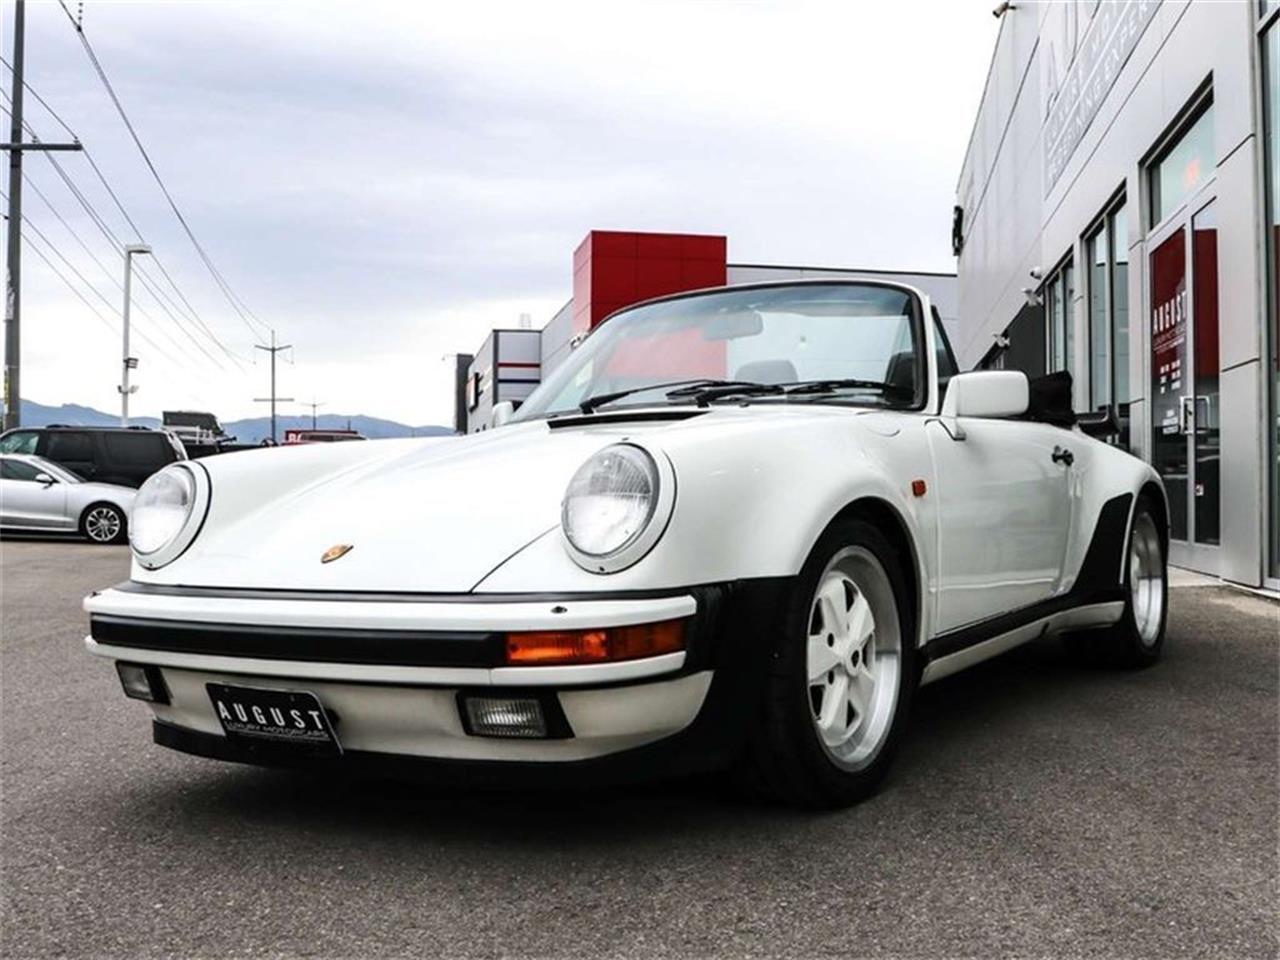 1989 Porsche 911 For Sale Classiccarscom Cc 1235272